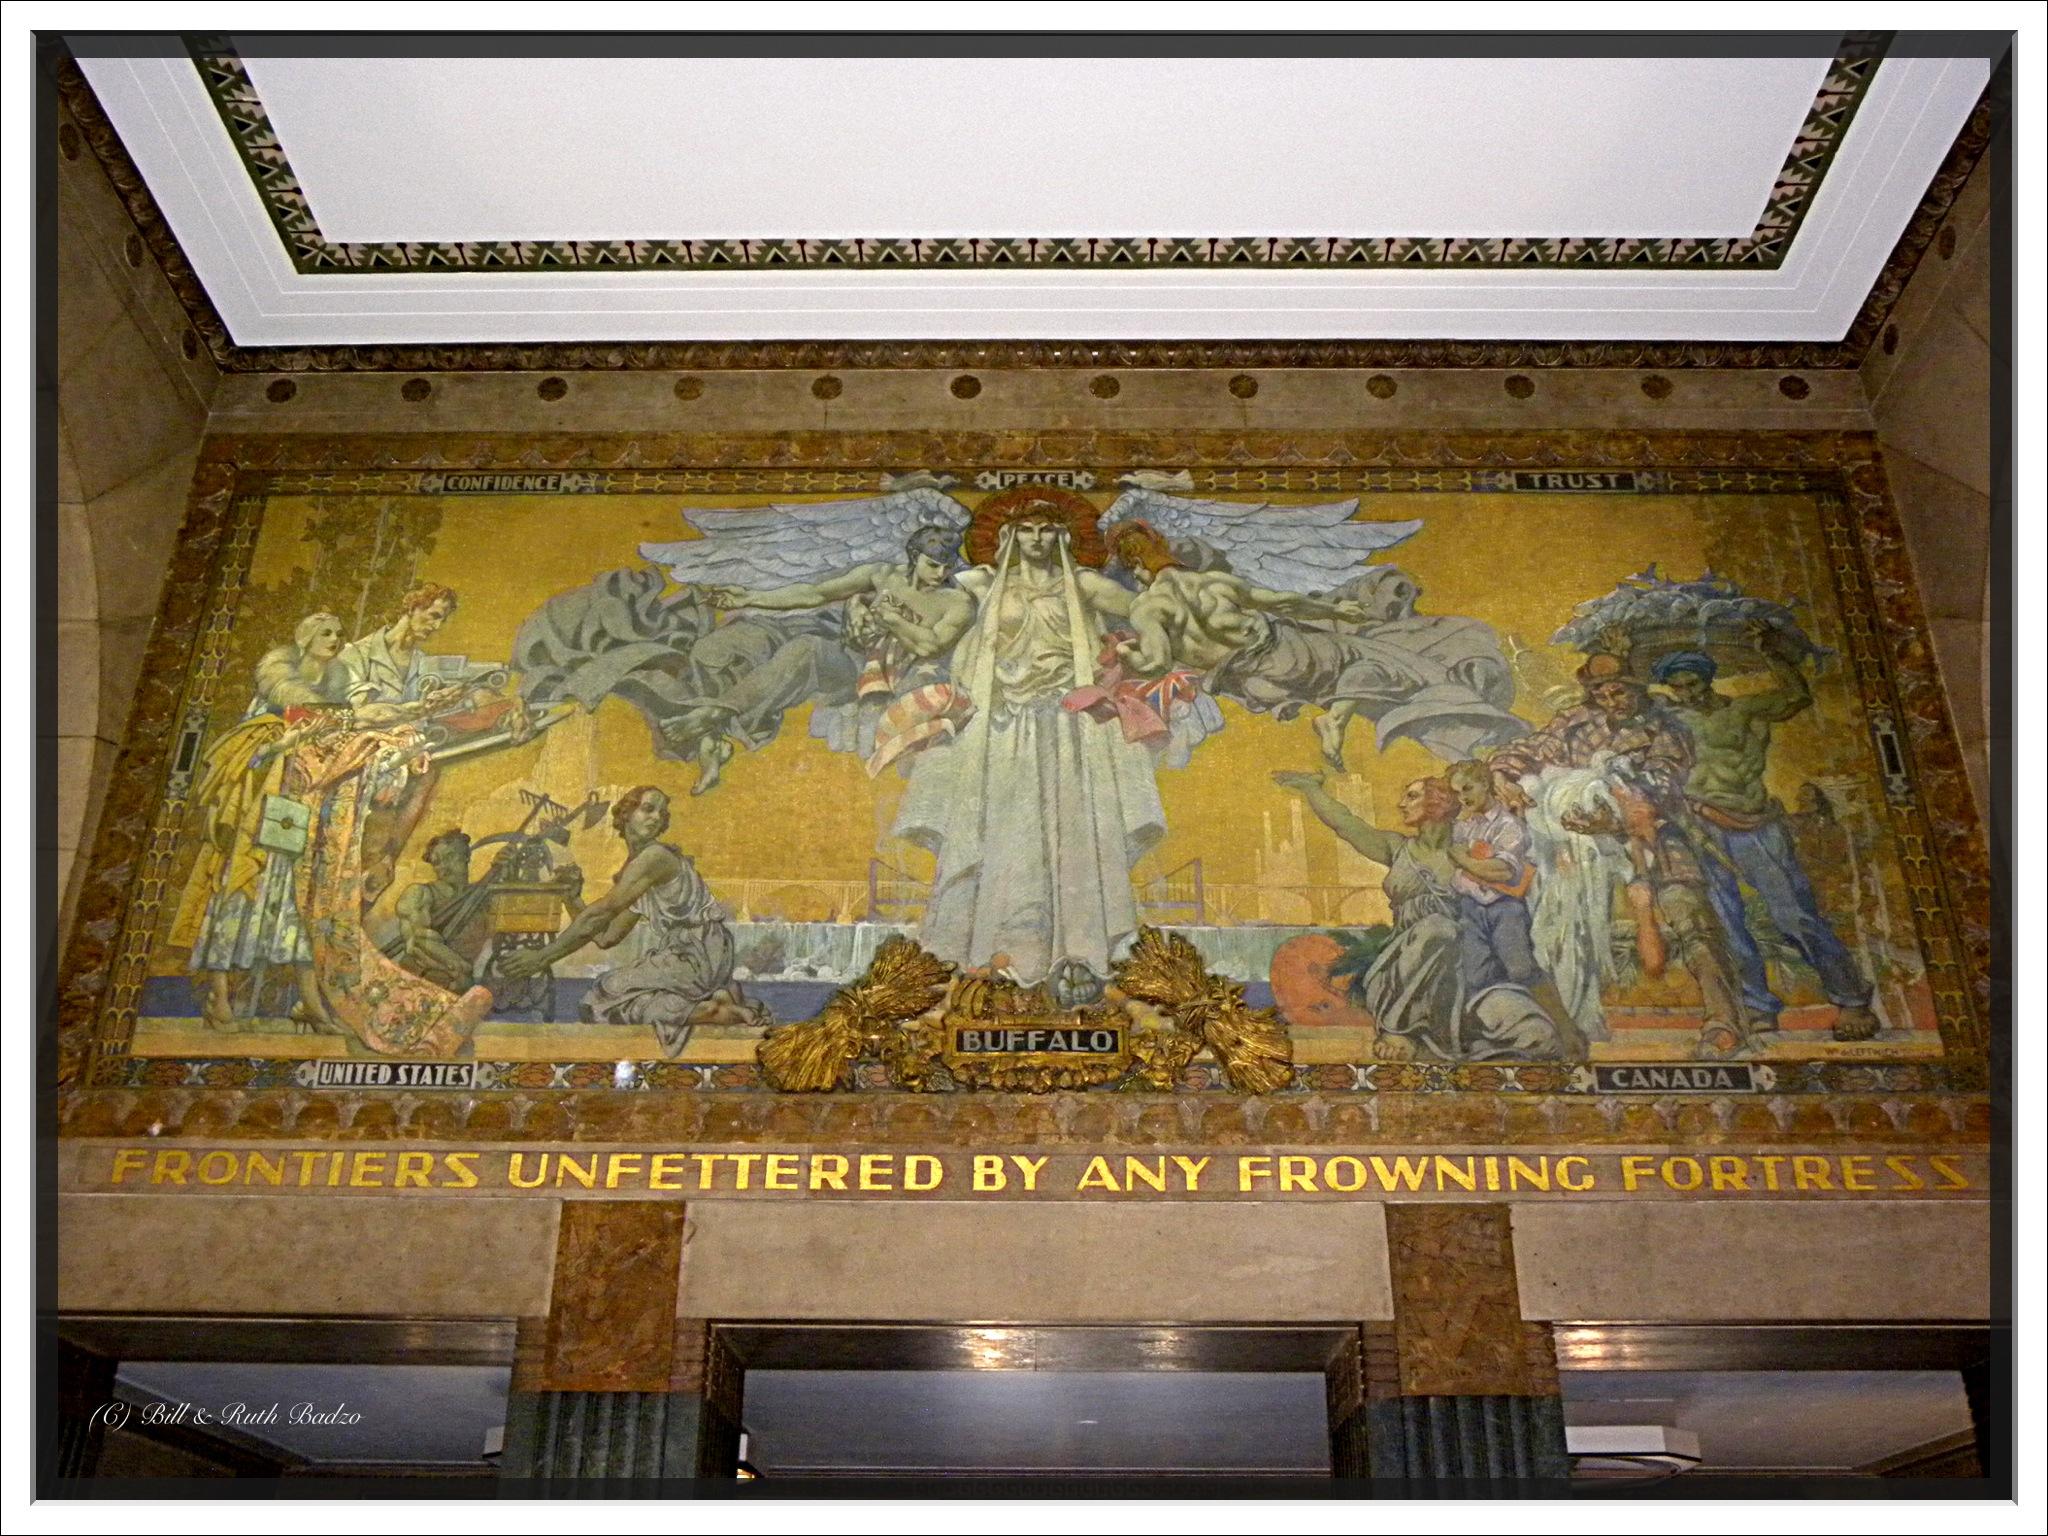 Buffalo newy york city hall interior mural historic for Bufflon revetement mural